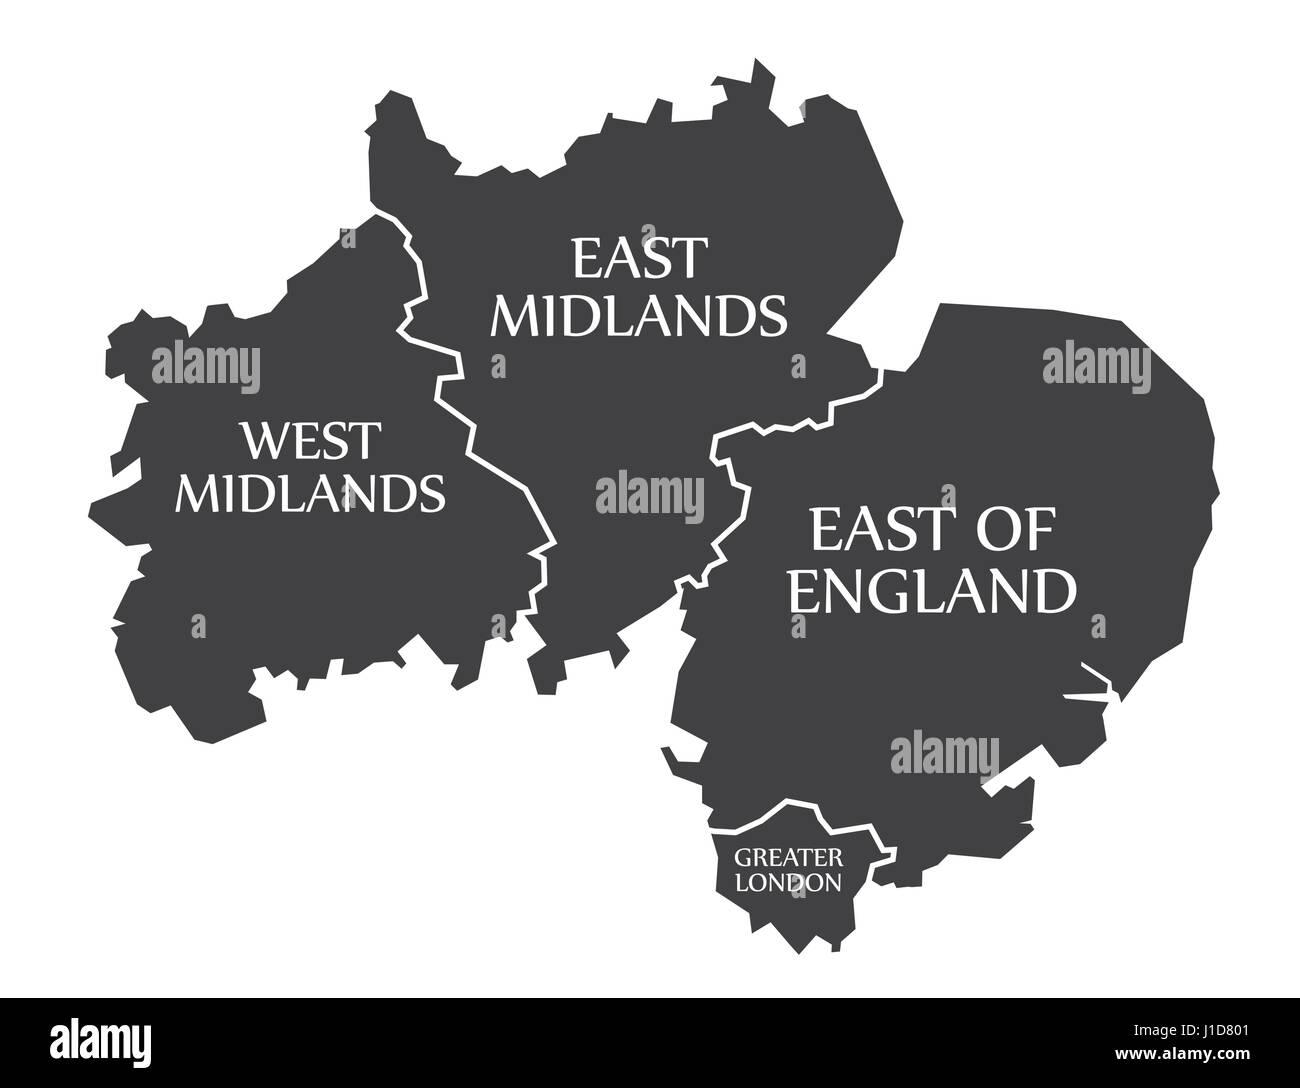 West Midlands East Midlands East Of England Greater London Map